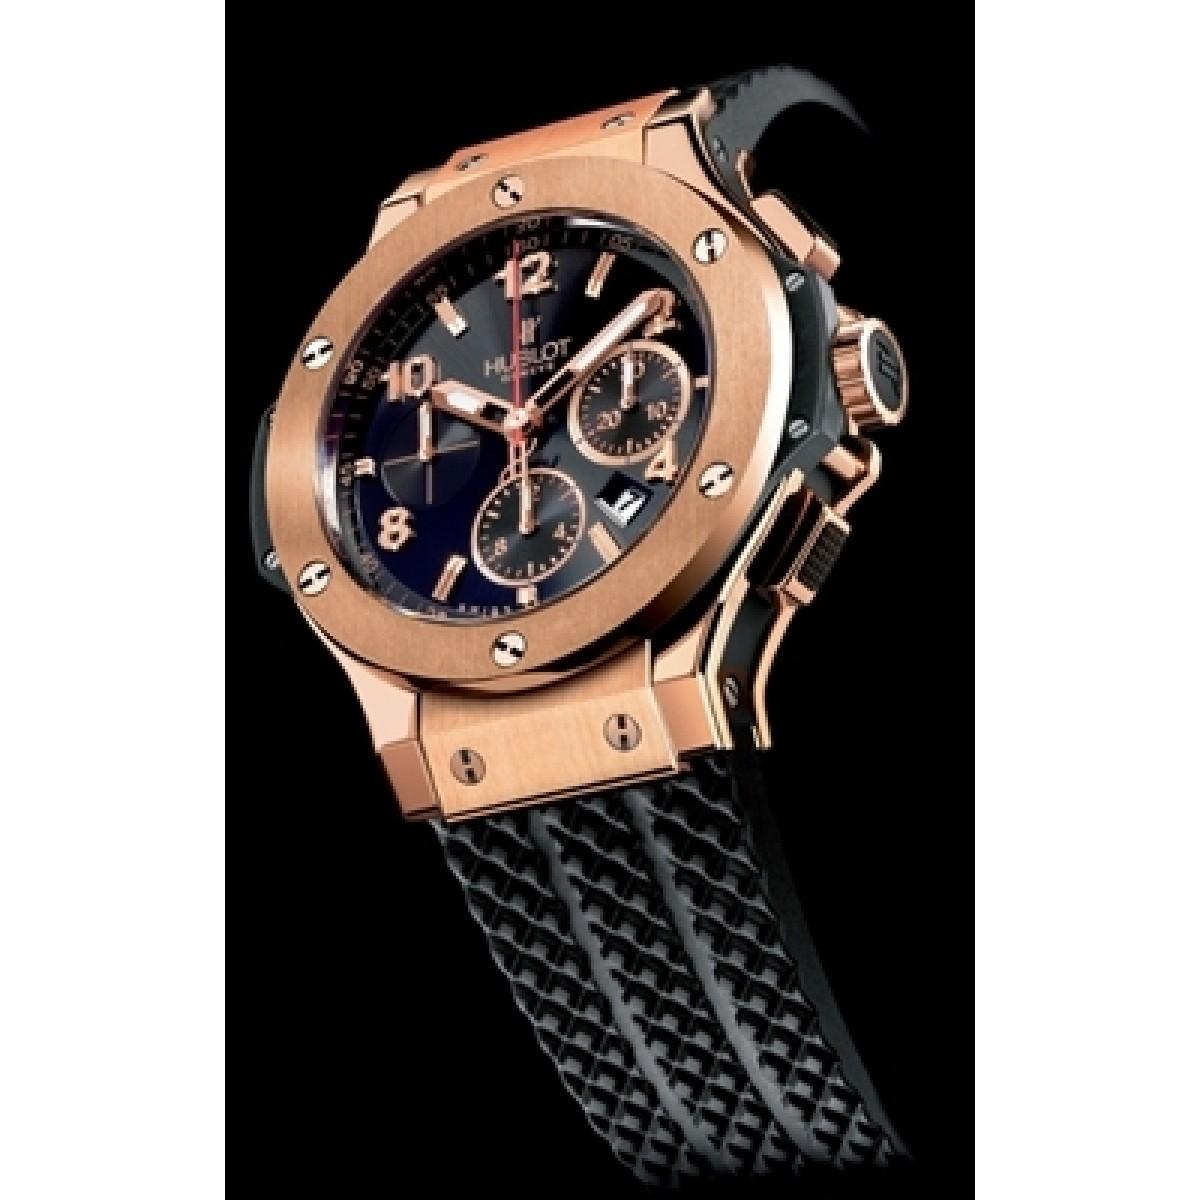 f59efee2250 Relógio Réplica Hublot Big Band Red Gold